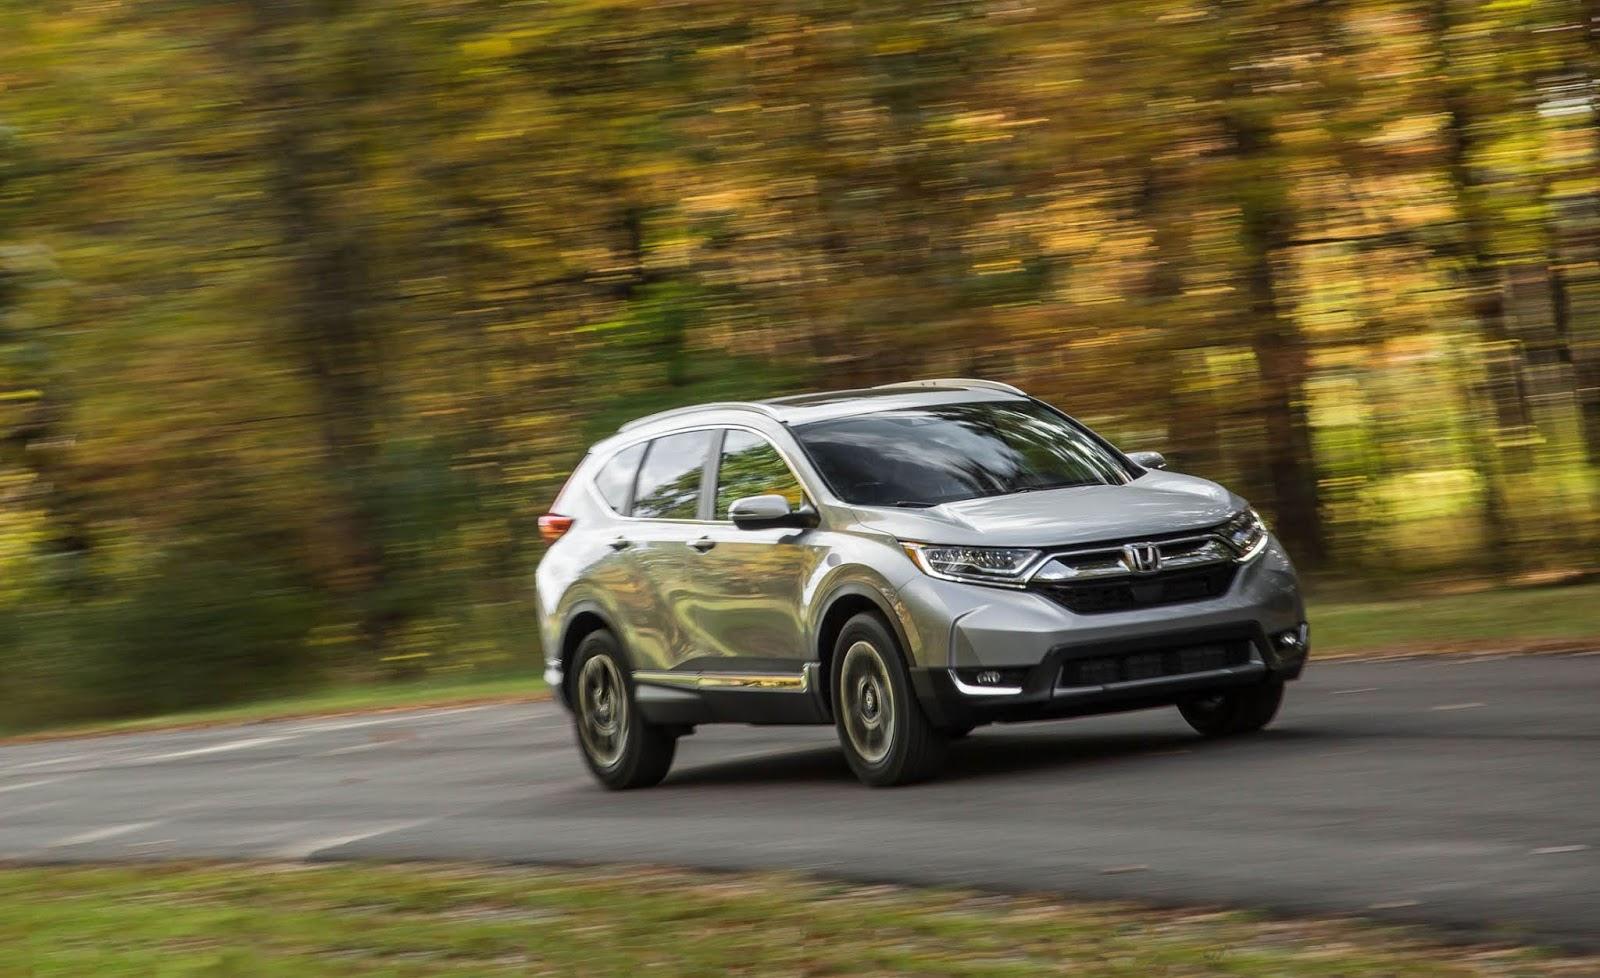 Pacific Honda Blog: Best Honda Vehicles for Camping